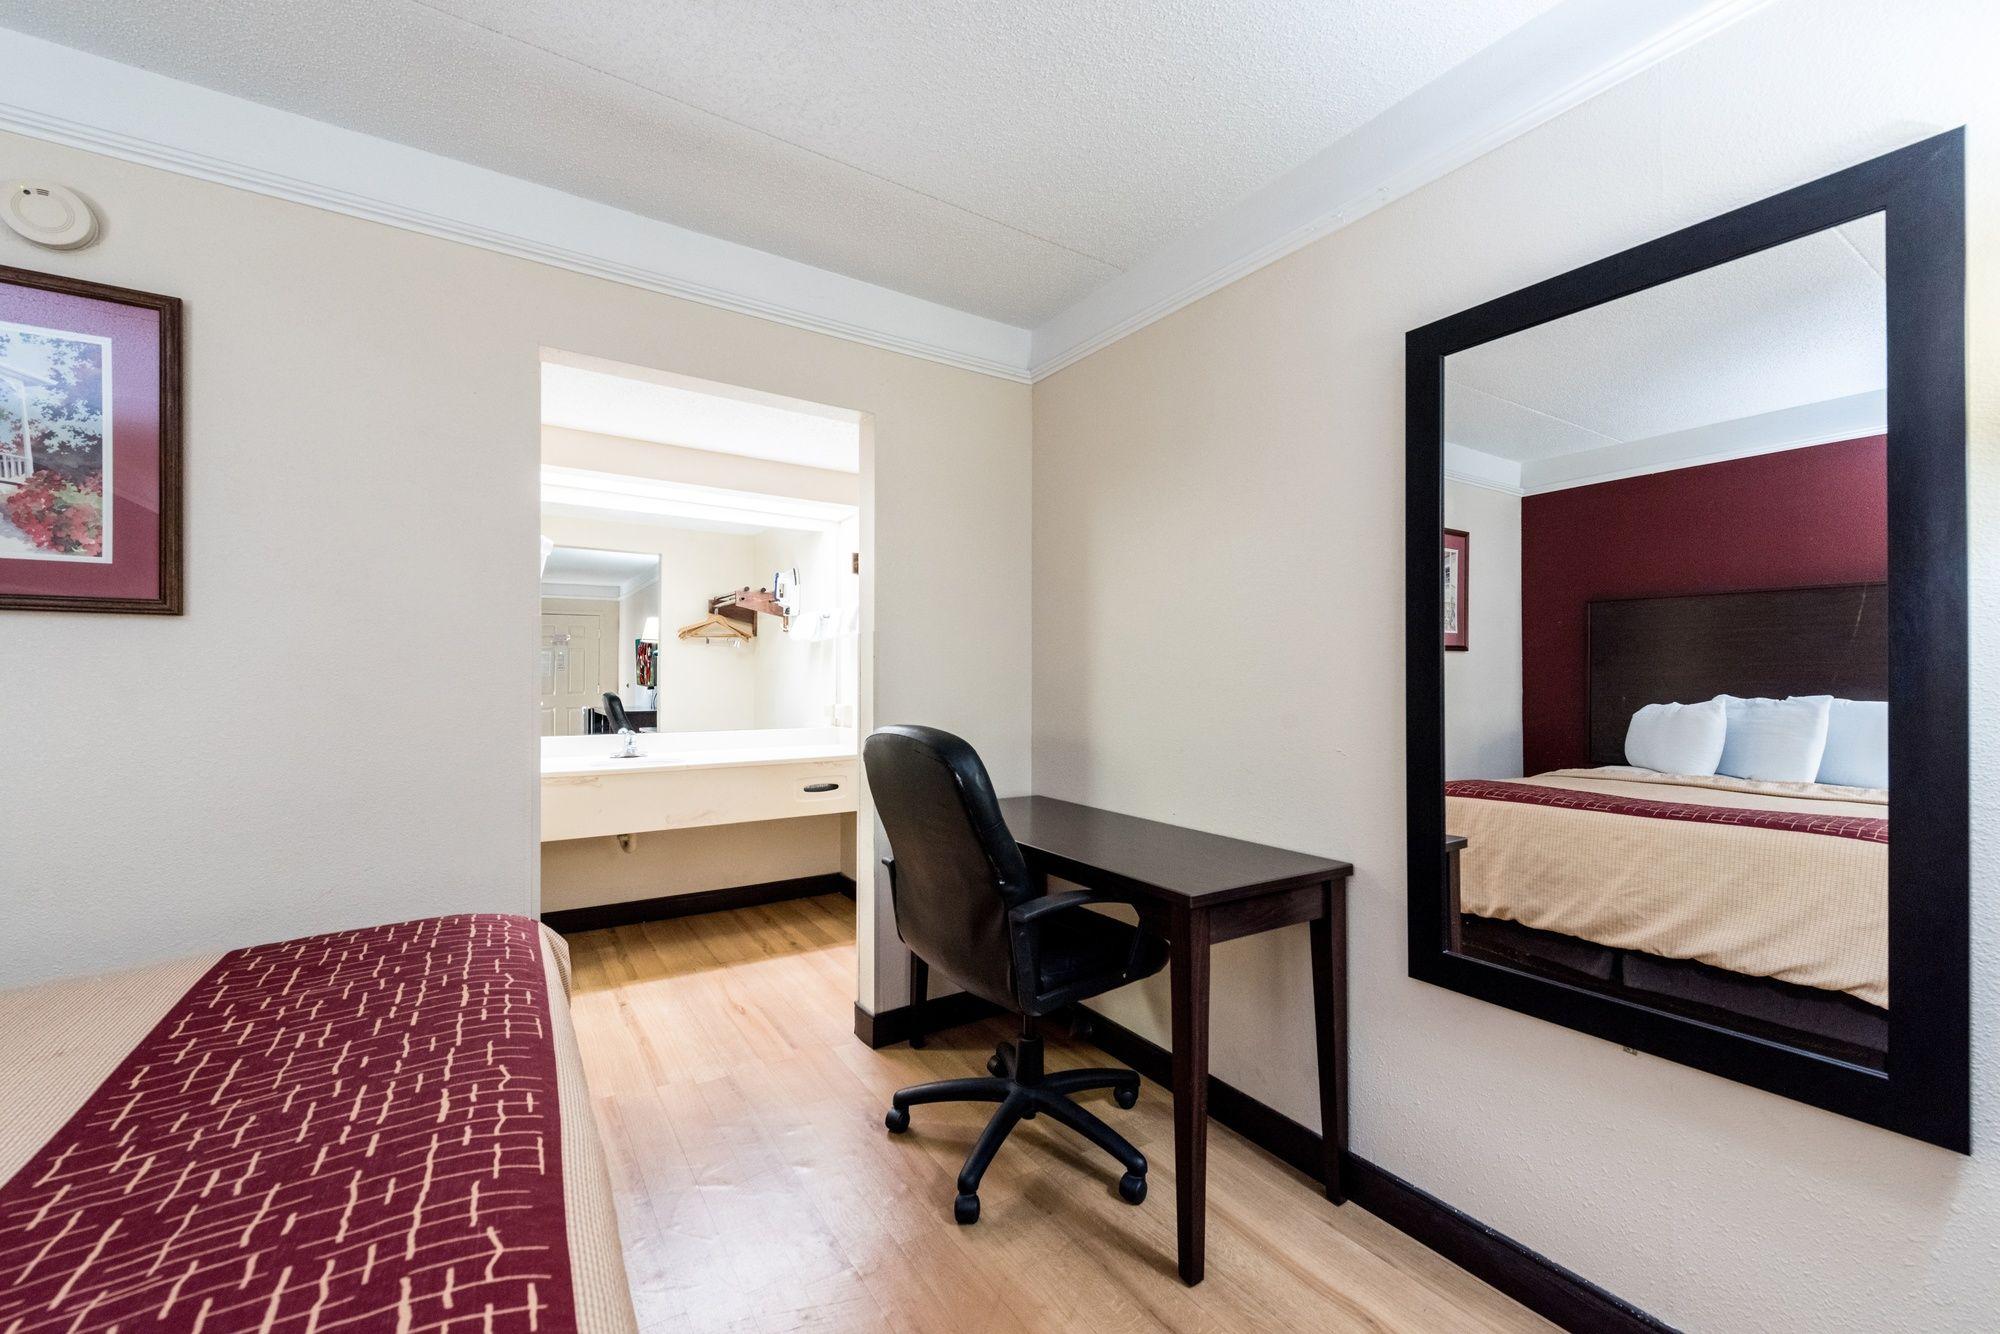 Elegant ... TN Red Roof Inn U0026 Suites Clinton In Clinton, TN